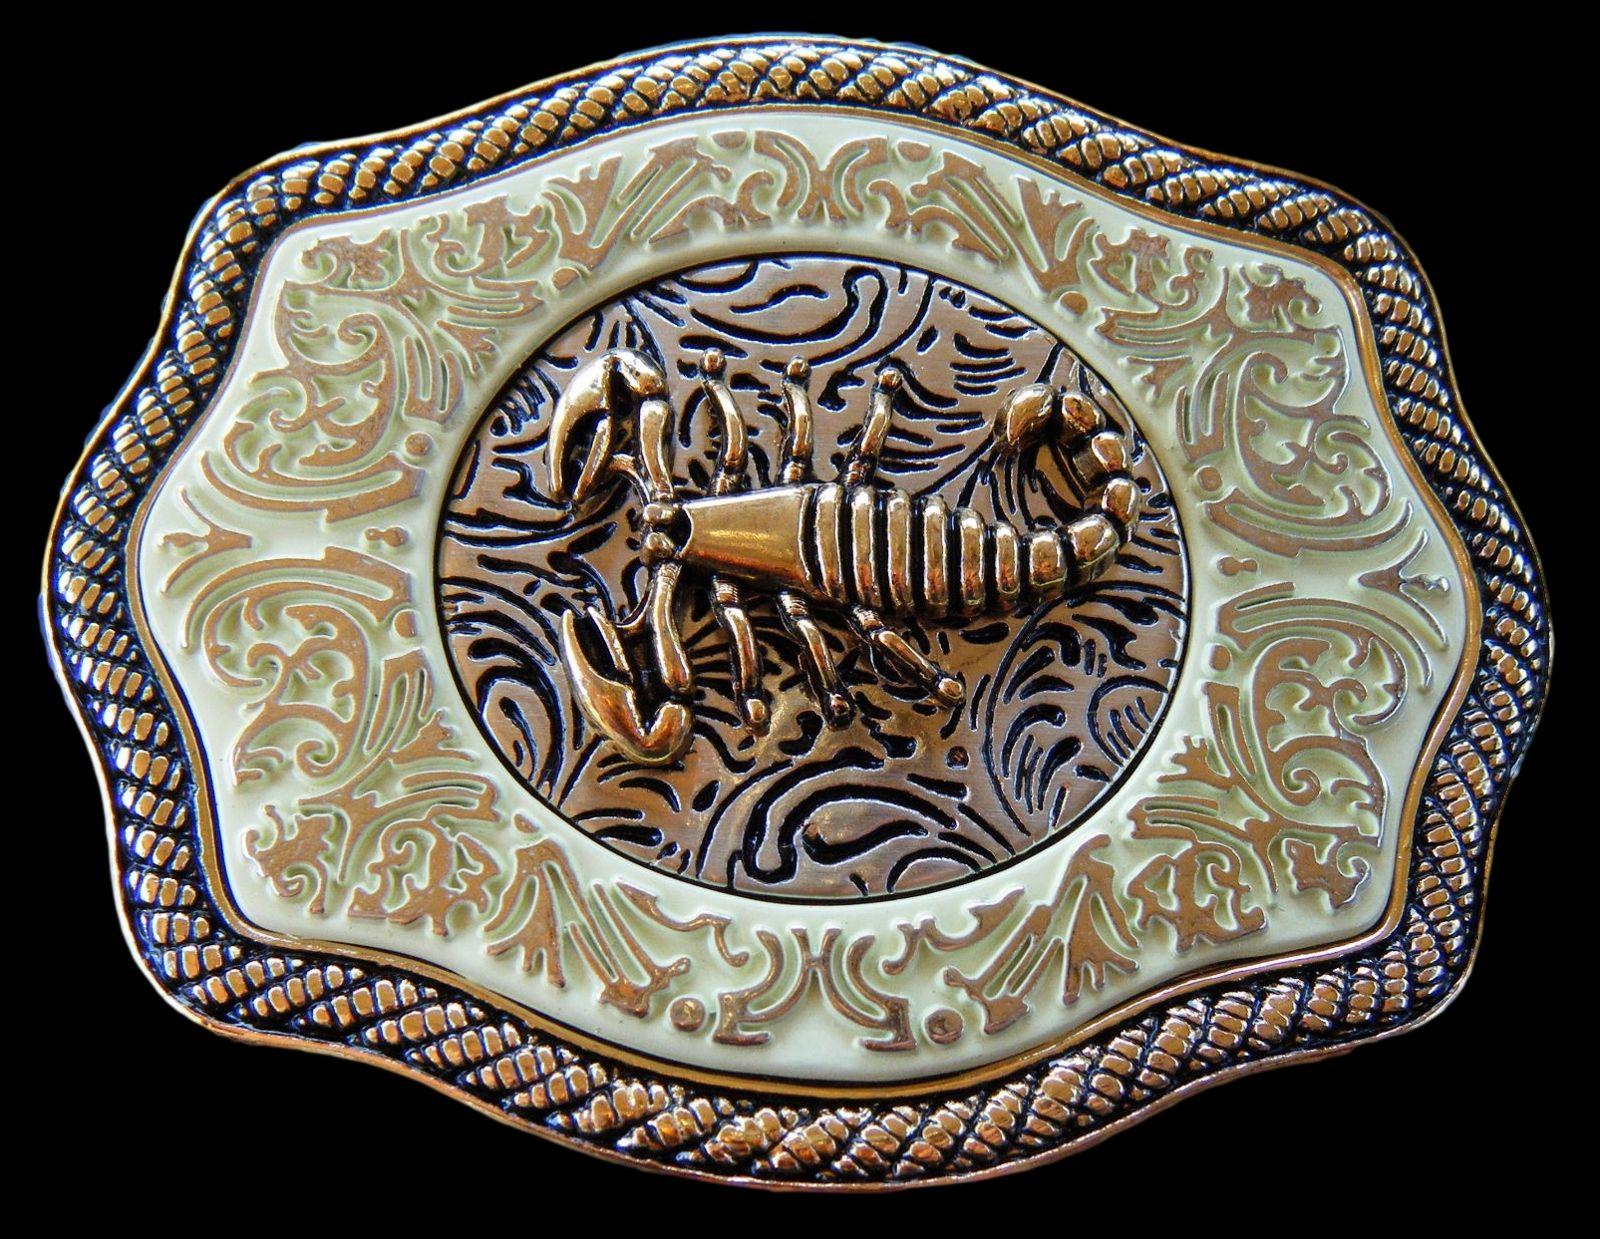 Big Scorpion Belt Buckle Zodiac Sign Cowboy Fashion Metal New Rodeo Mens Western